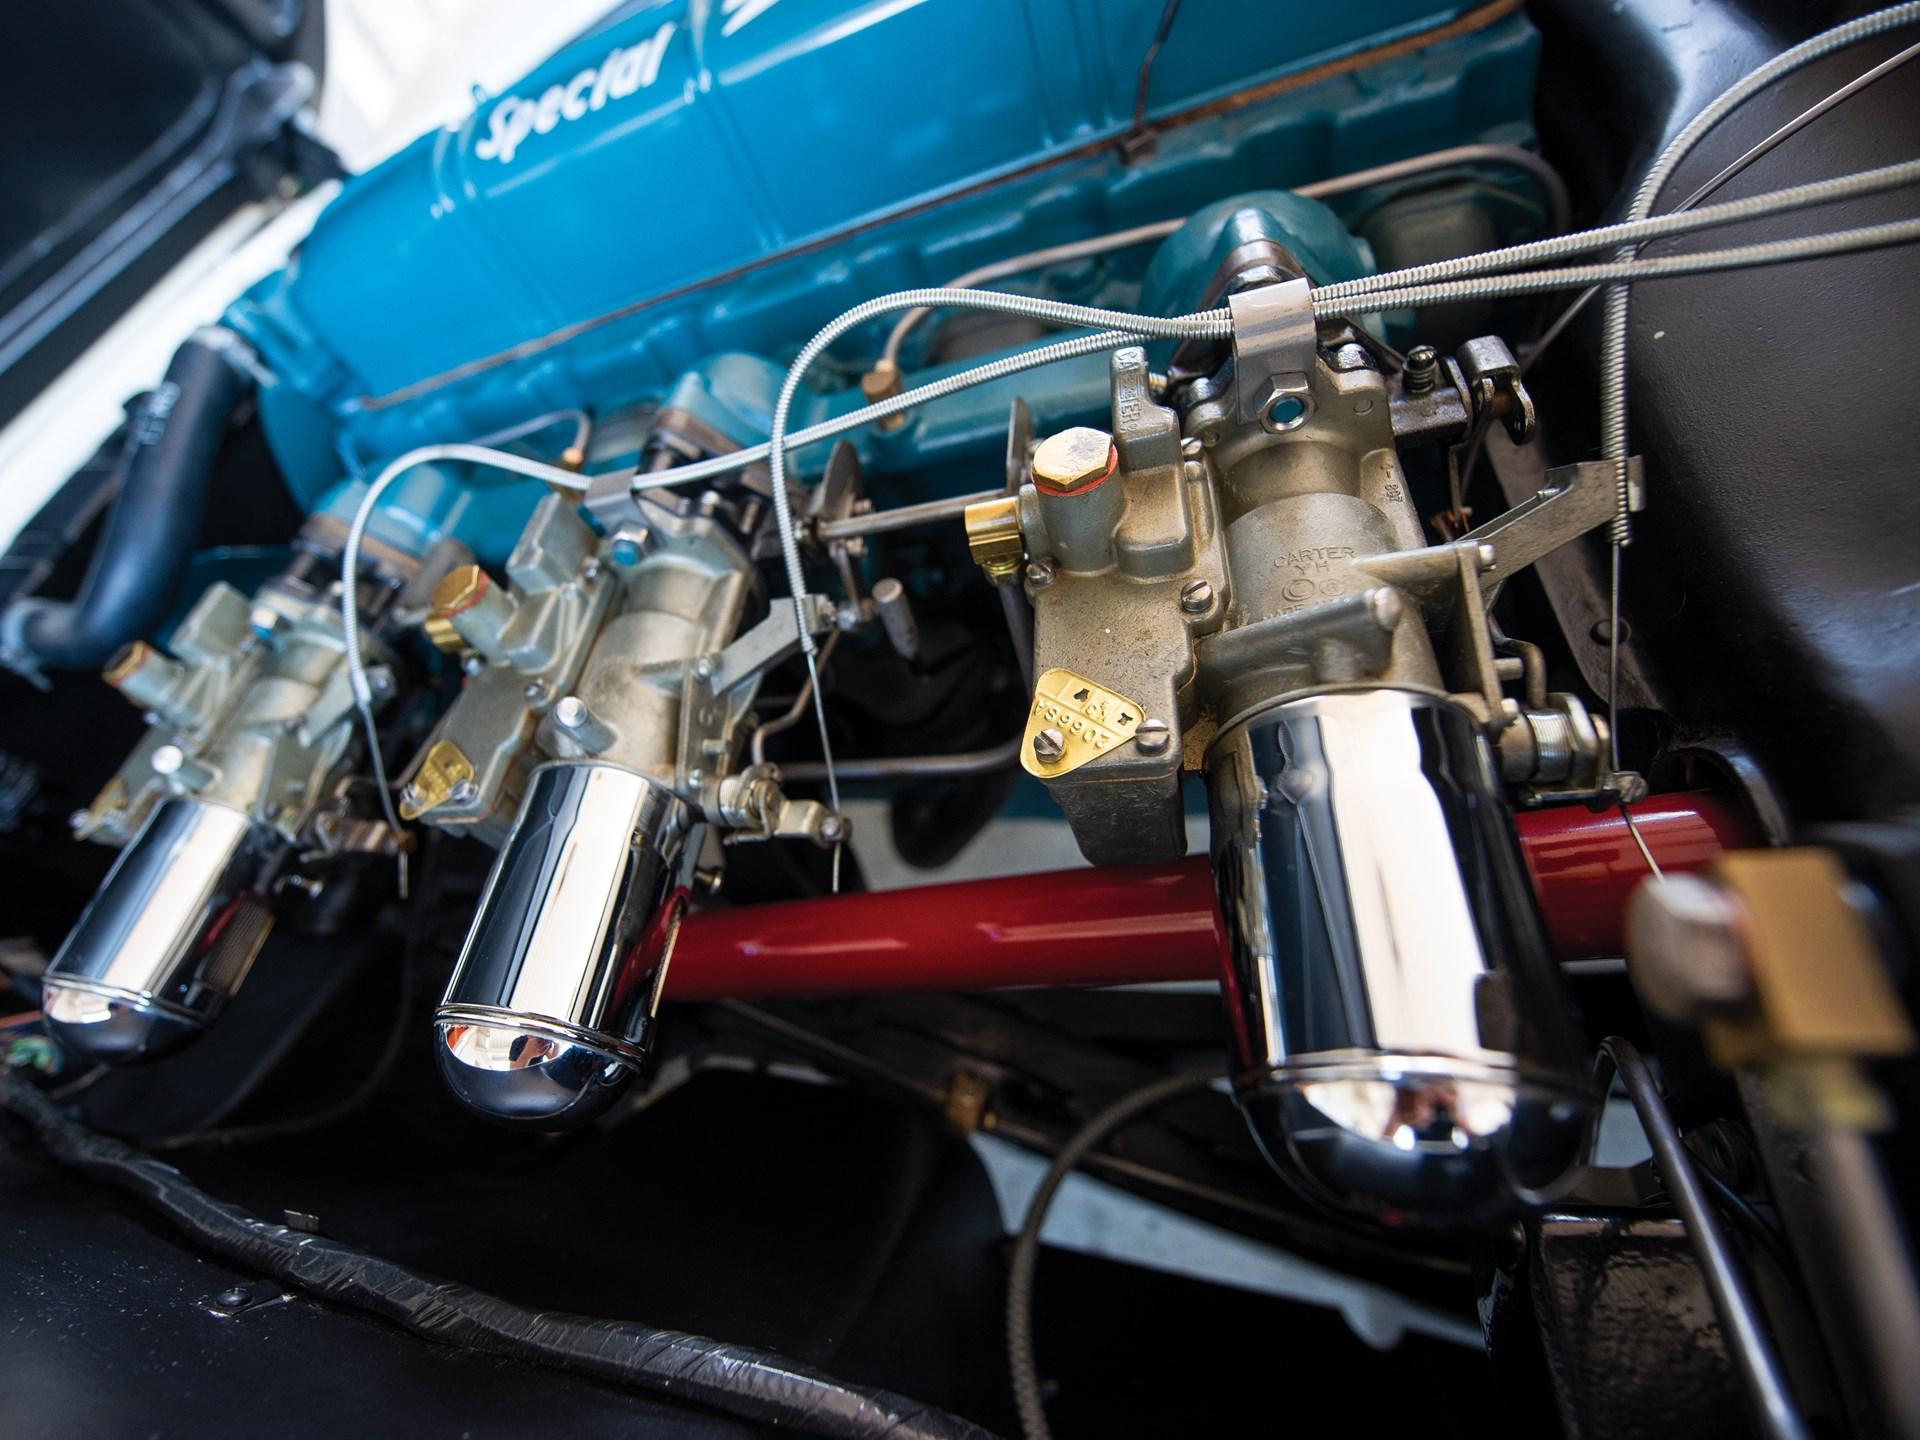 Rm Sotheby's 1953 Chevrolet Corvette Monterey 2018. 1953 Chevrolet Corvette. Corvette. 1953 Corvette Engine Wiring At Scoala.co